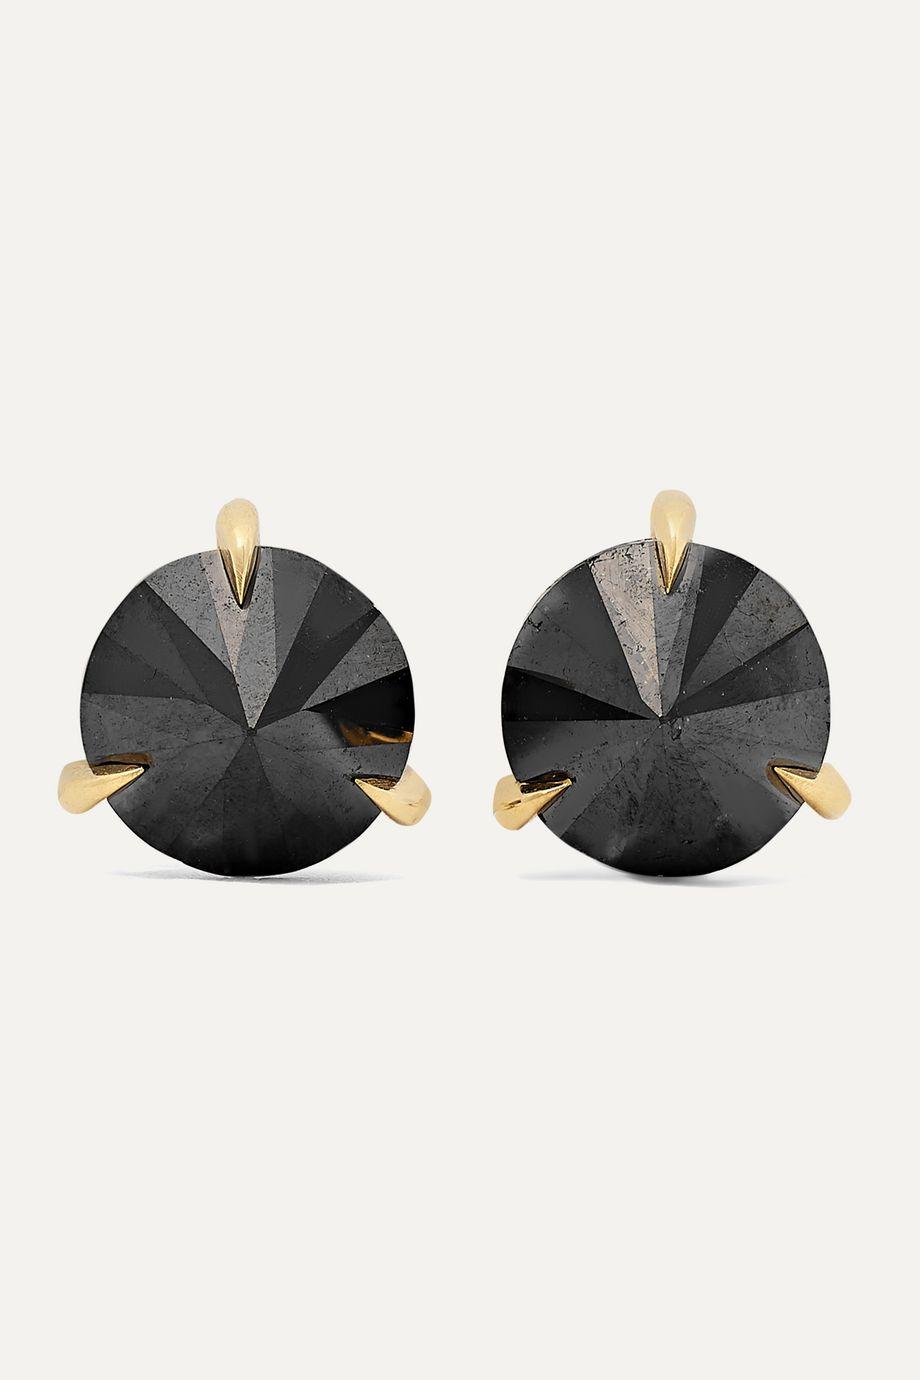 Ara Vartanian Ohrringe aus 18Karat Gold mit Diamanten